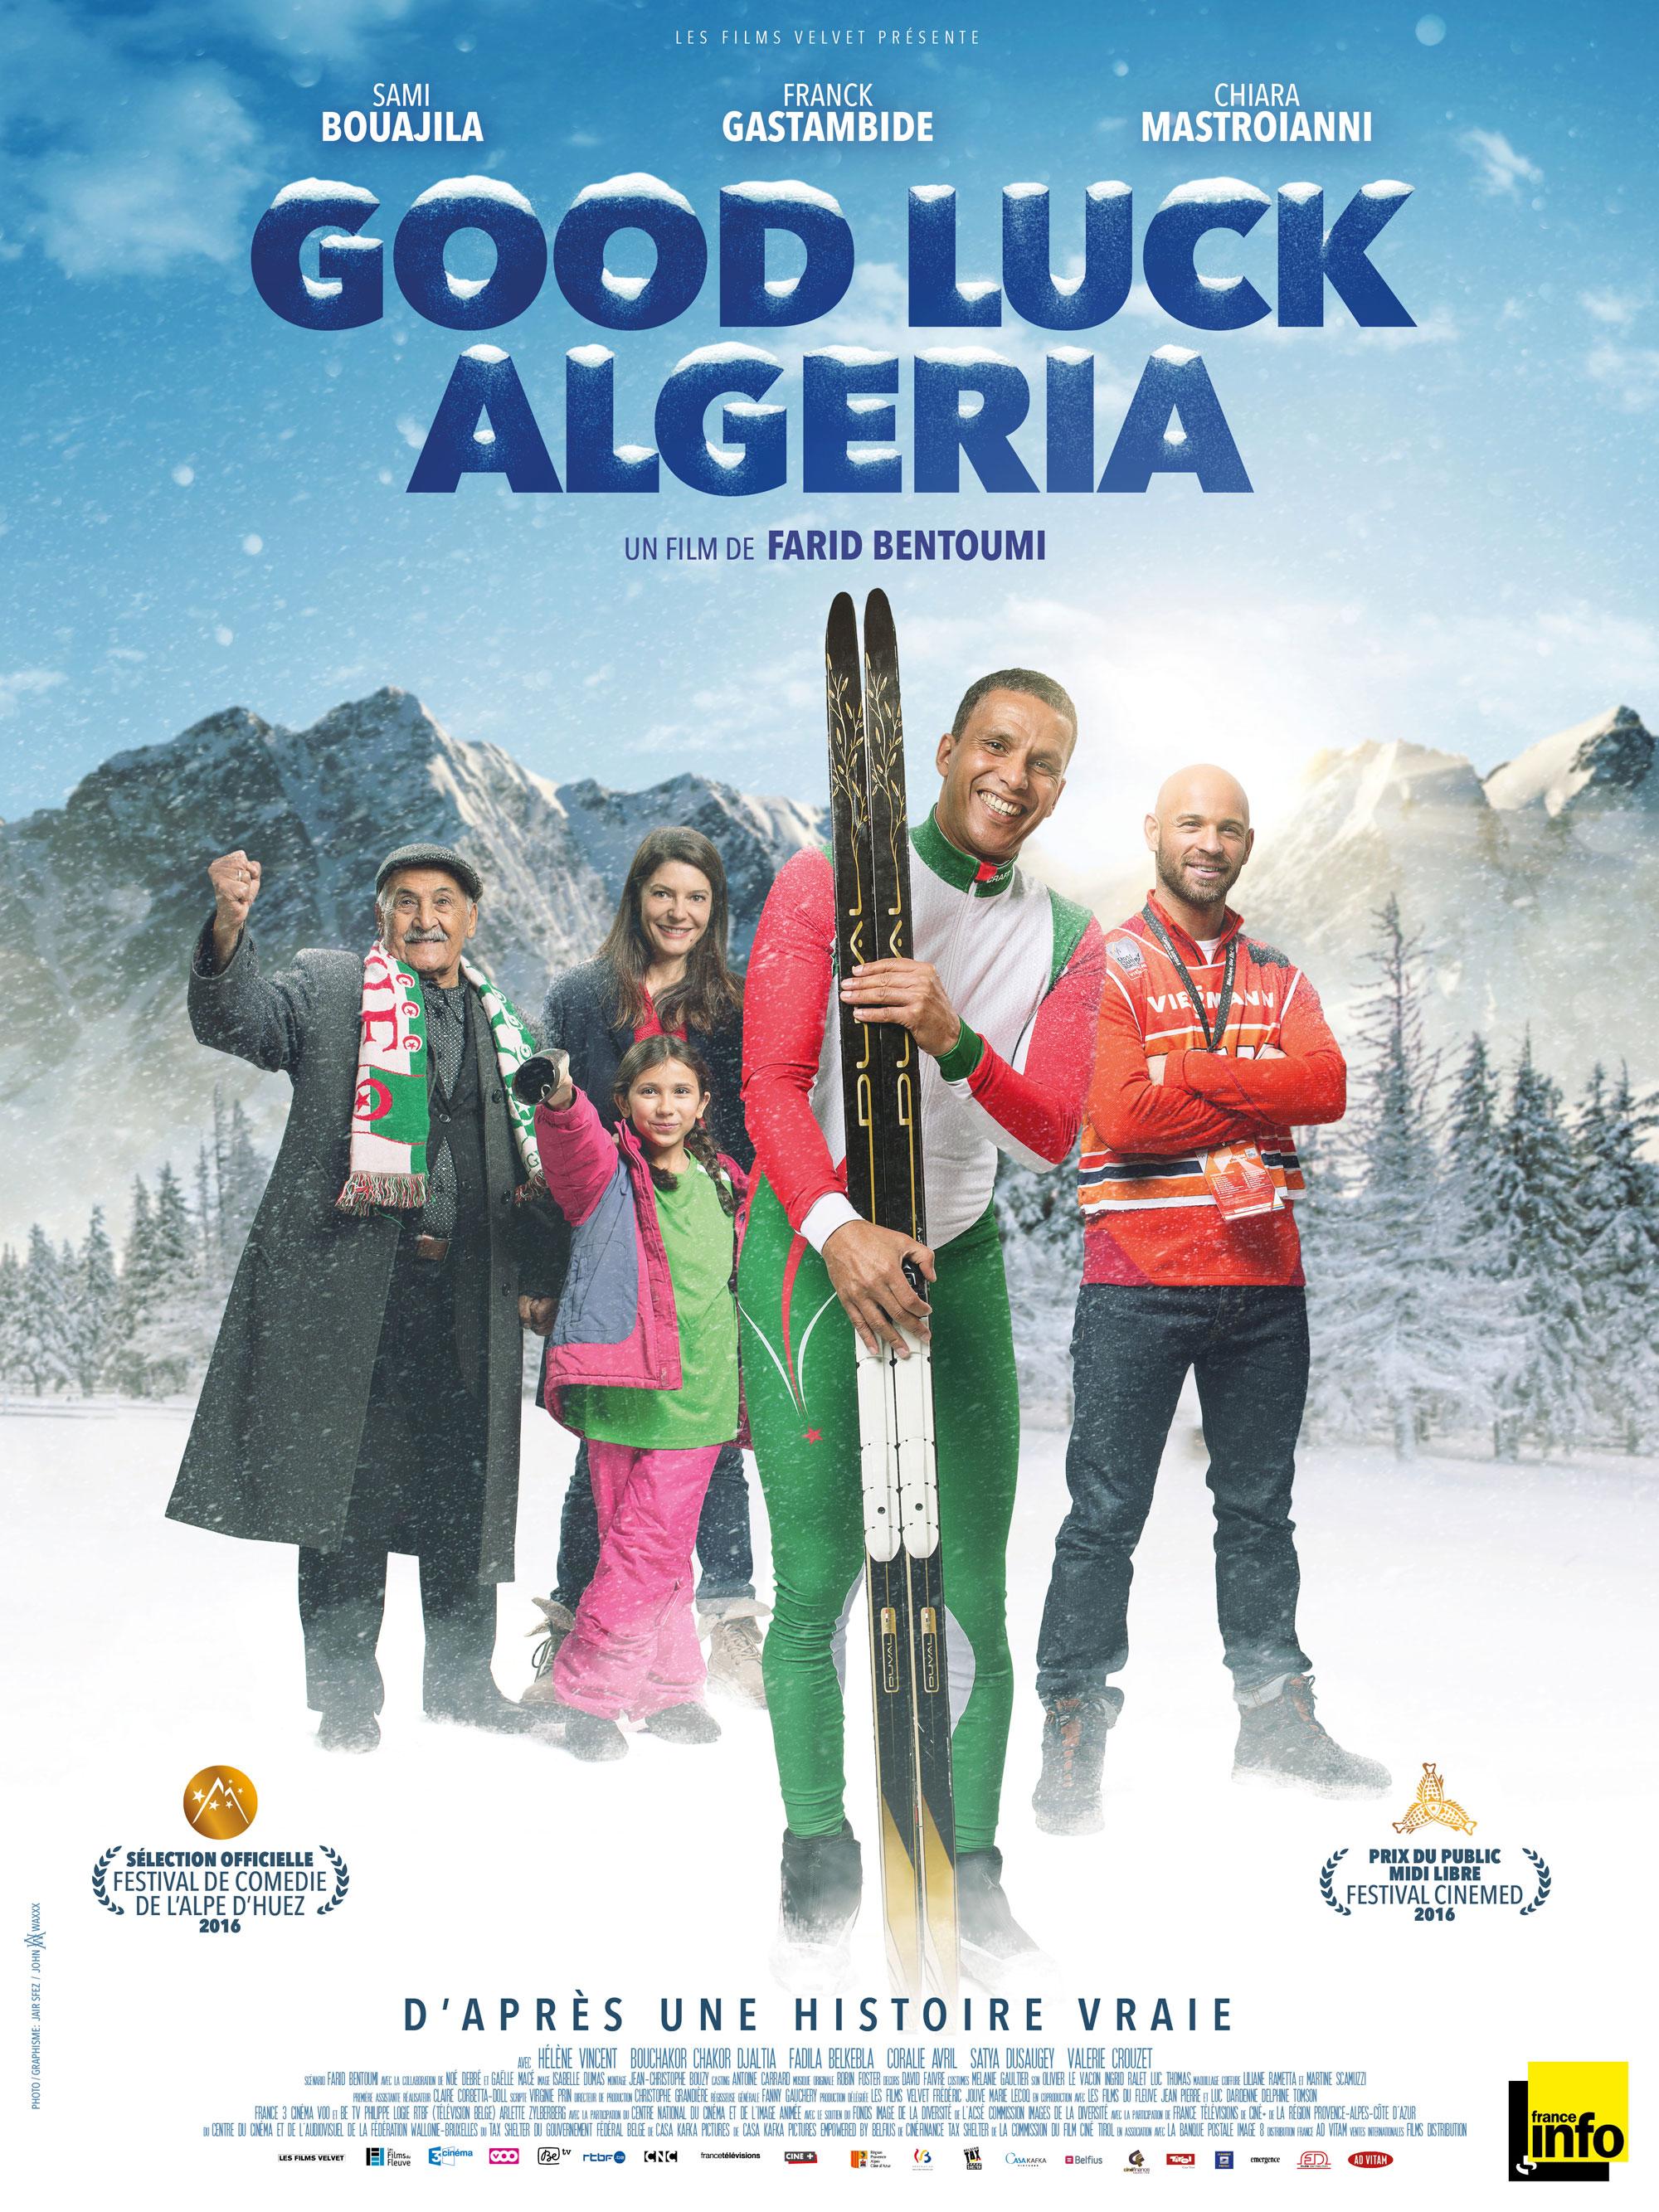 Good luck Algeria - Affiche